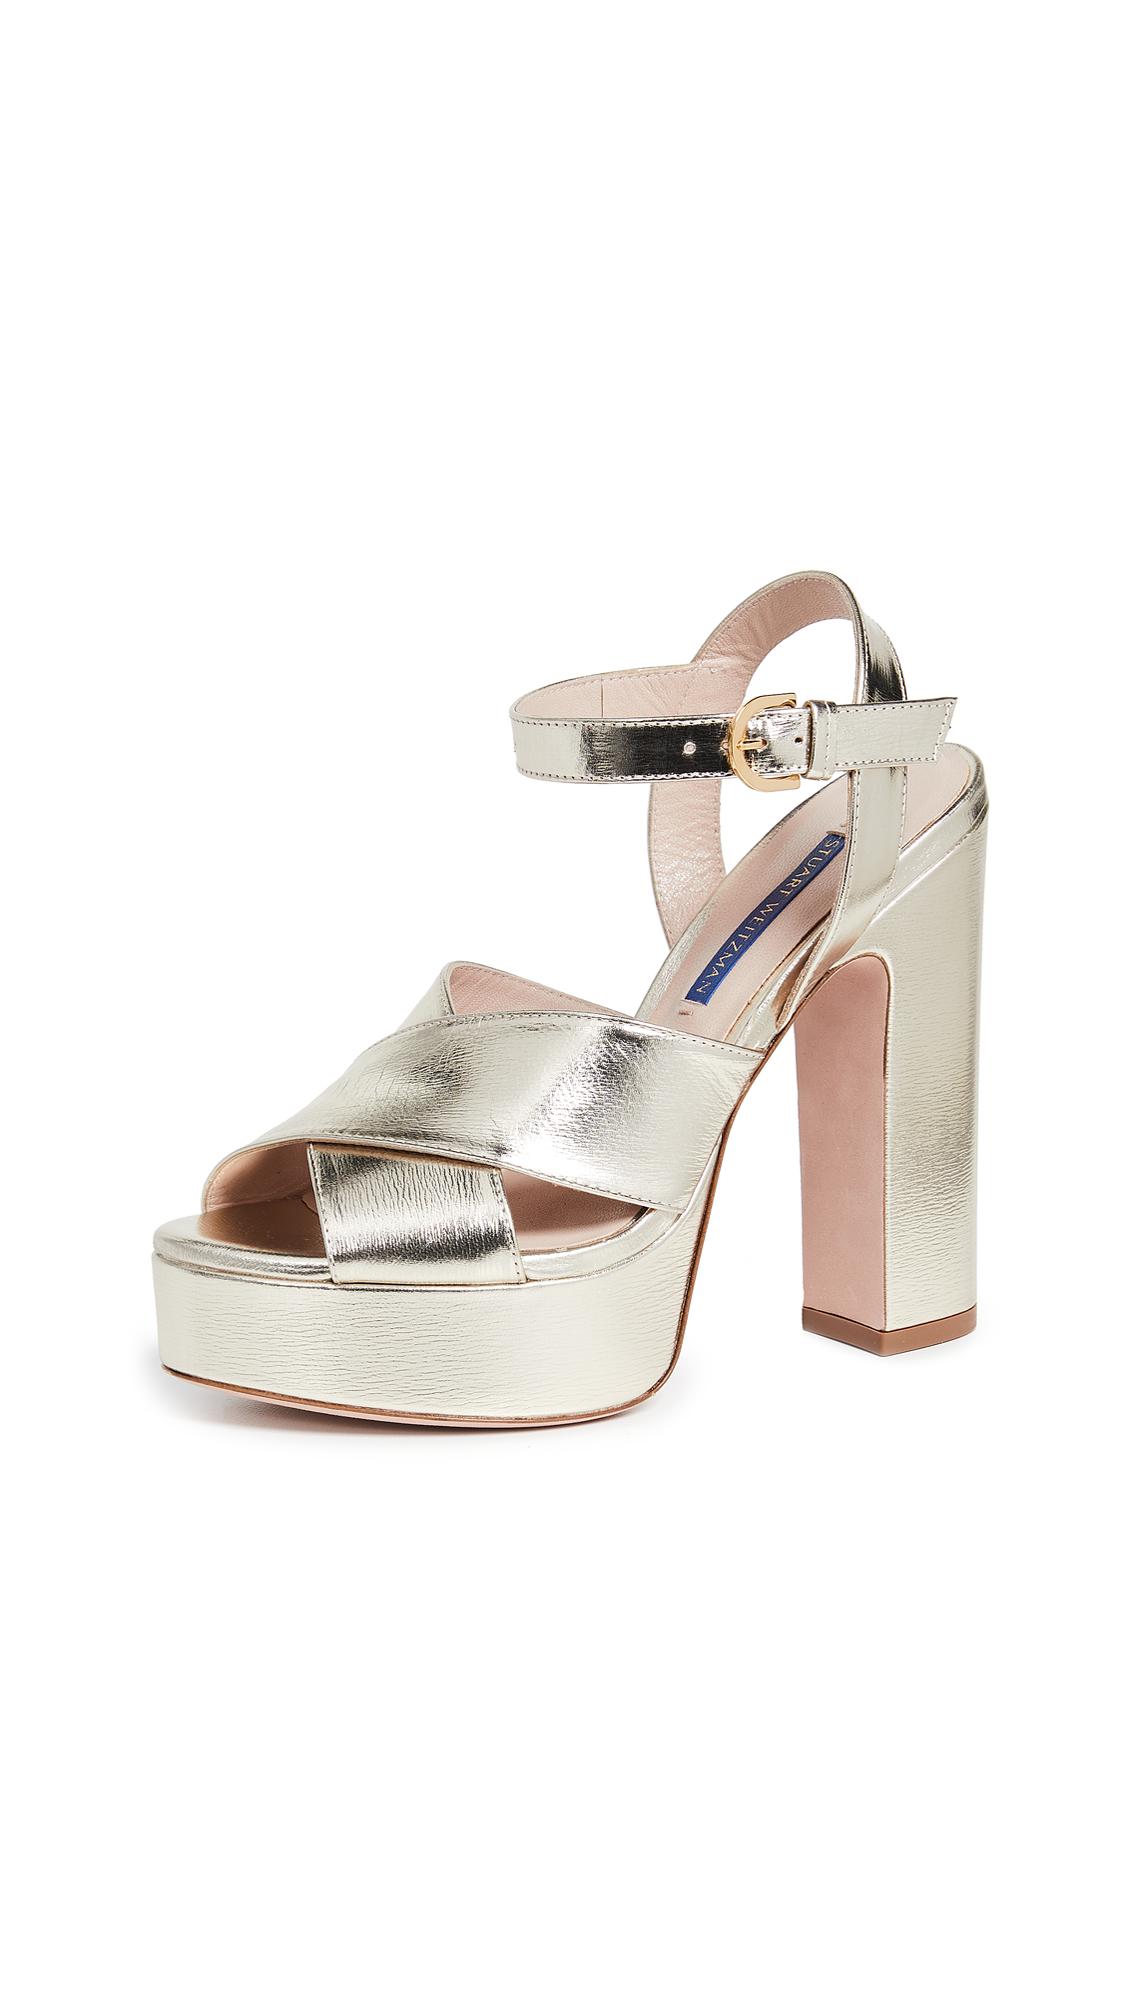 Stuart Weitzman Joni Platform Sandals - Platino